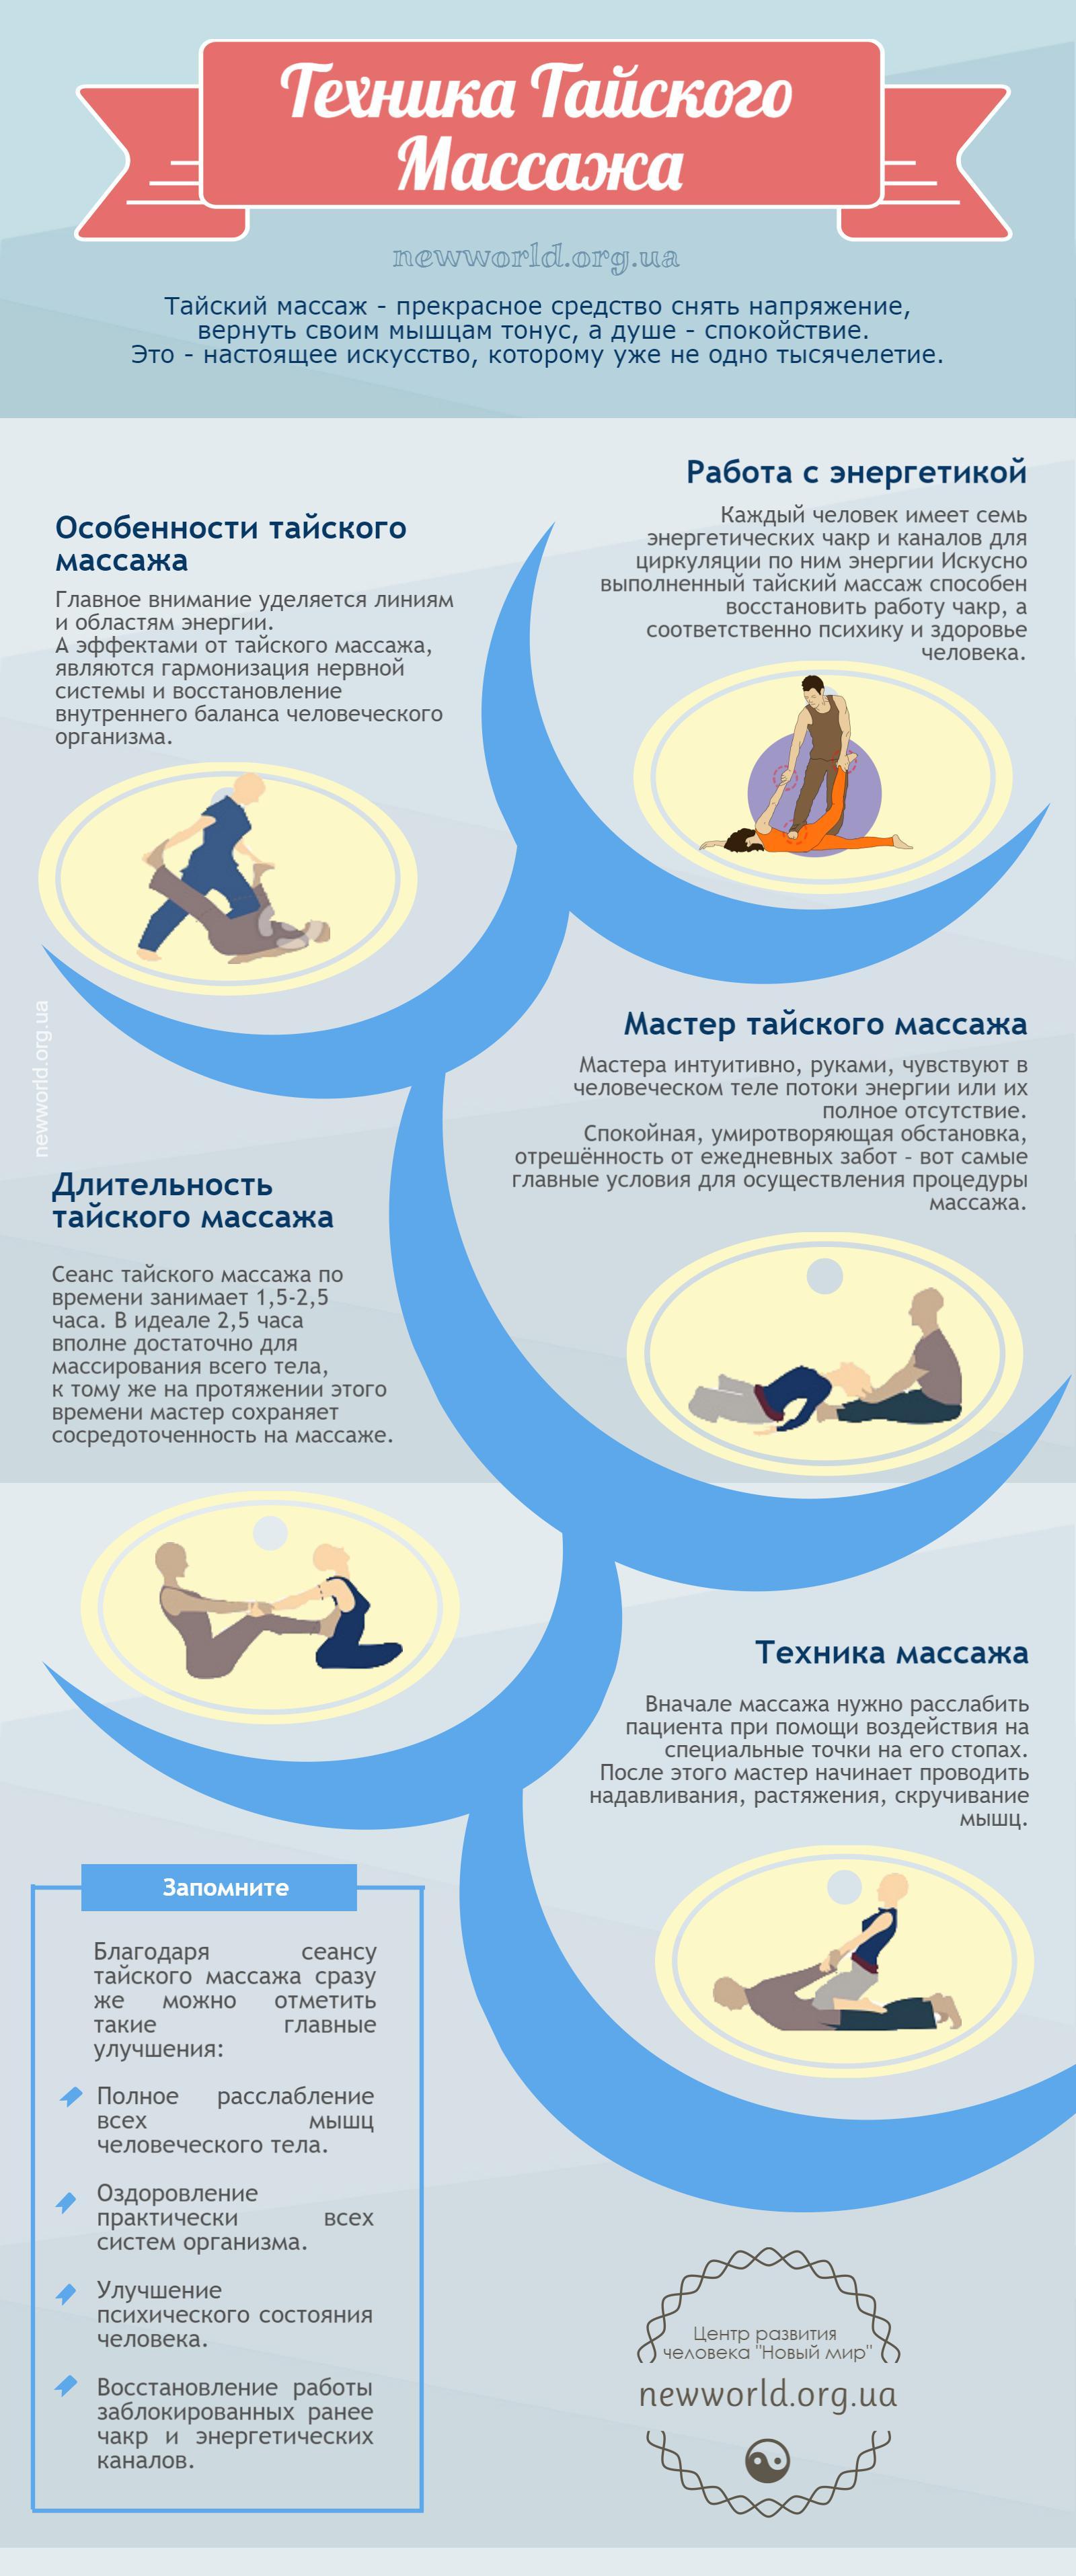 texnica thai massage